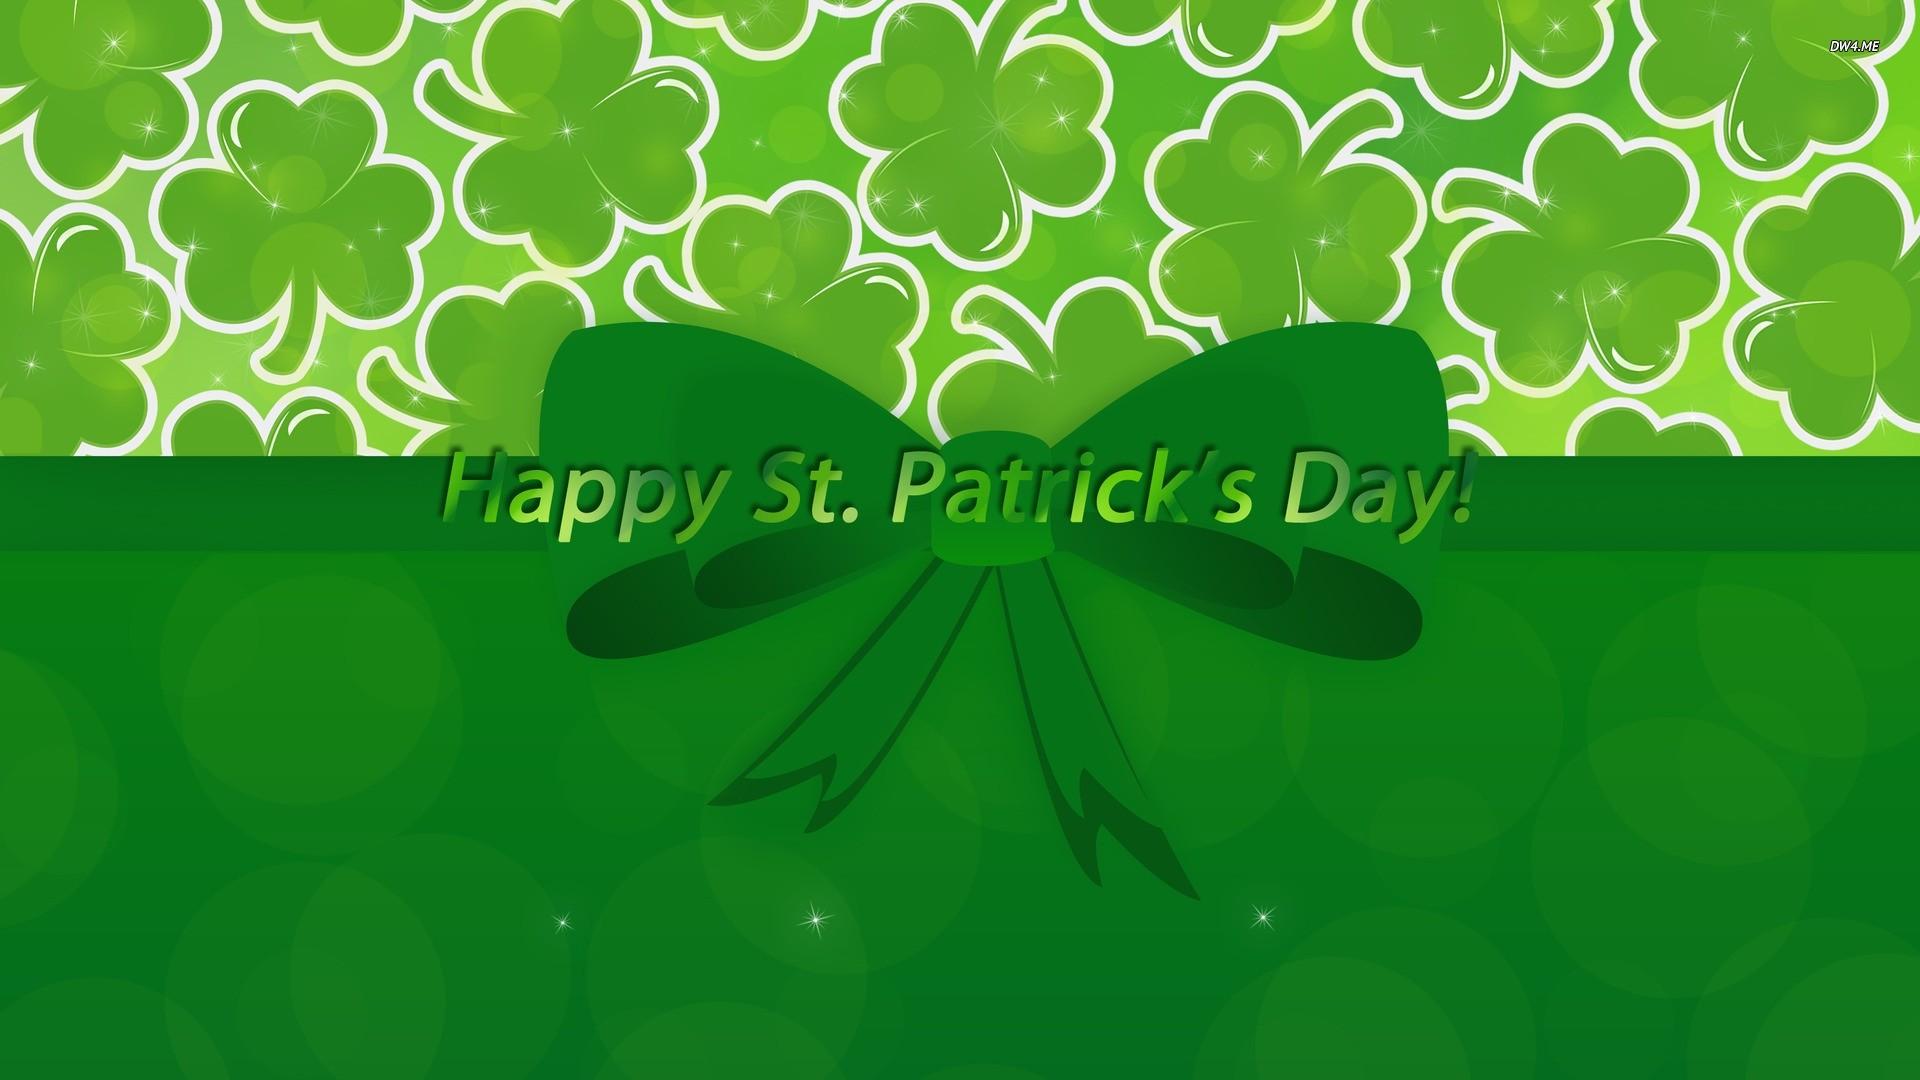 St. Patrick's Day 2021 Wallpaper